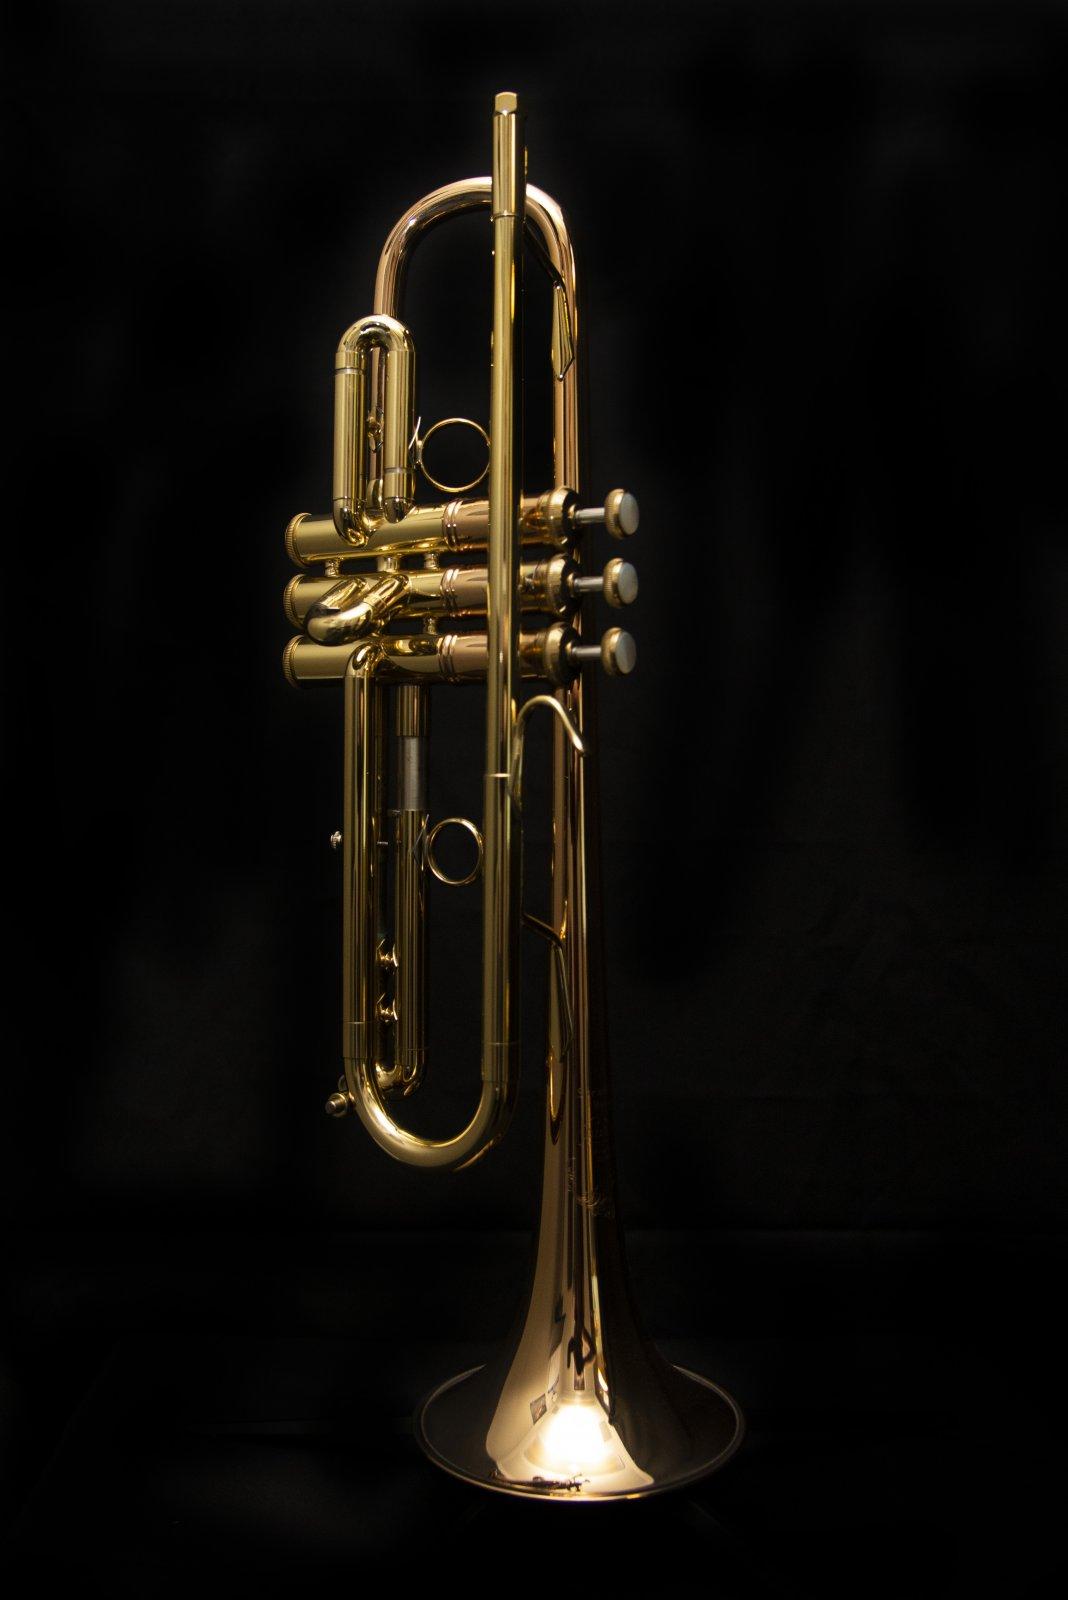 Bach LT1901B Stradivarius Commercial Bb Trumpet, Medium Large Bore